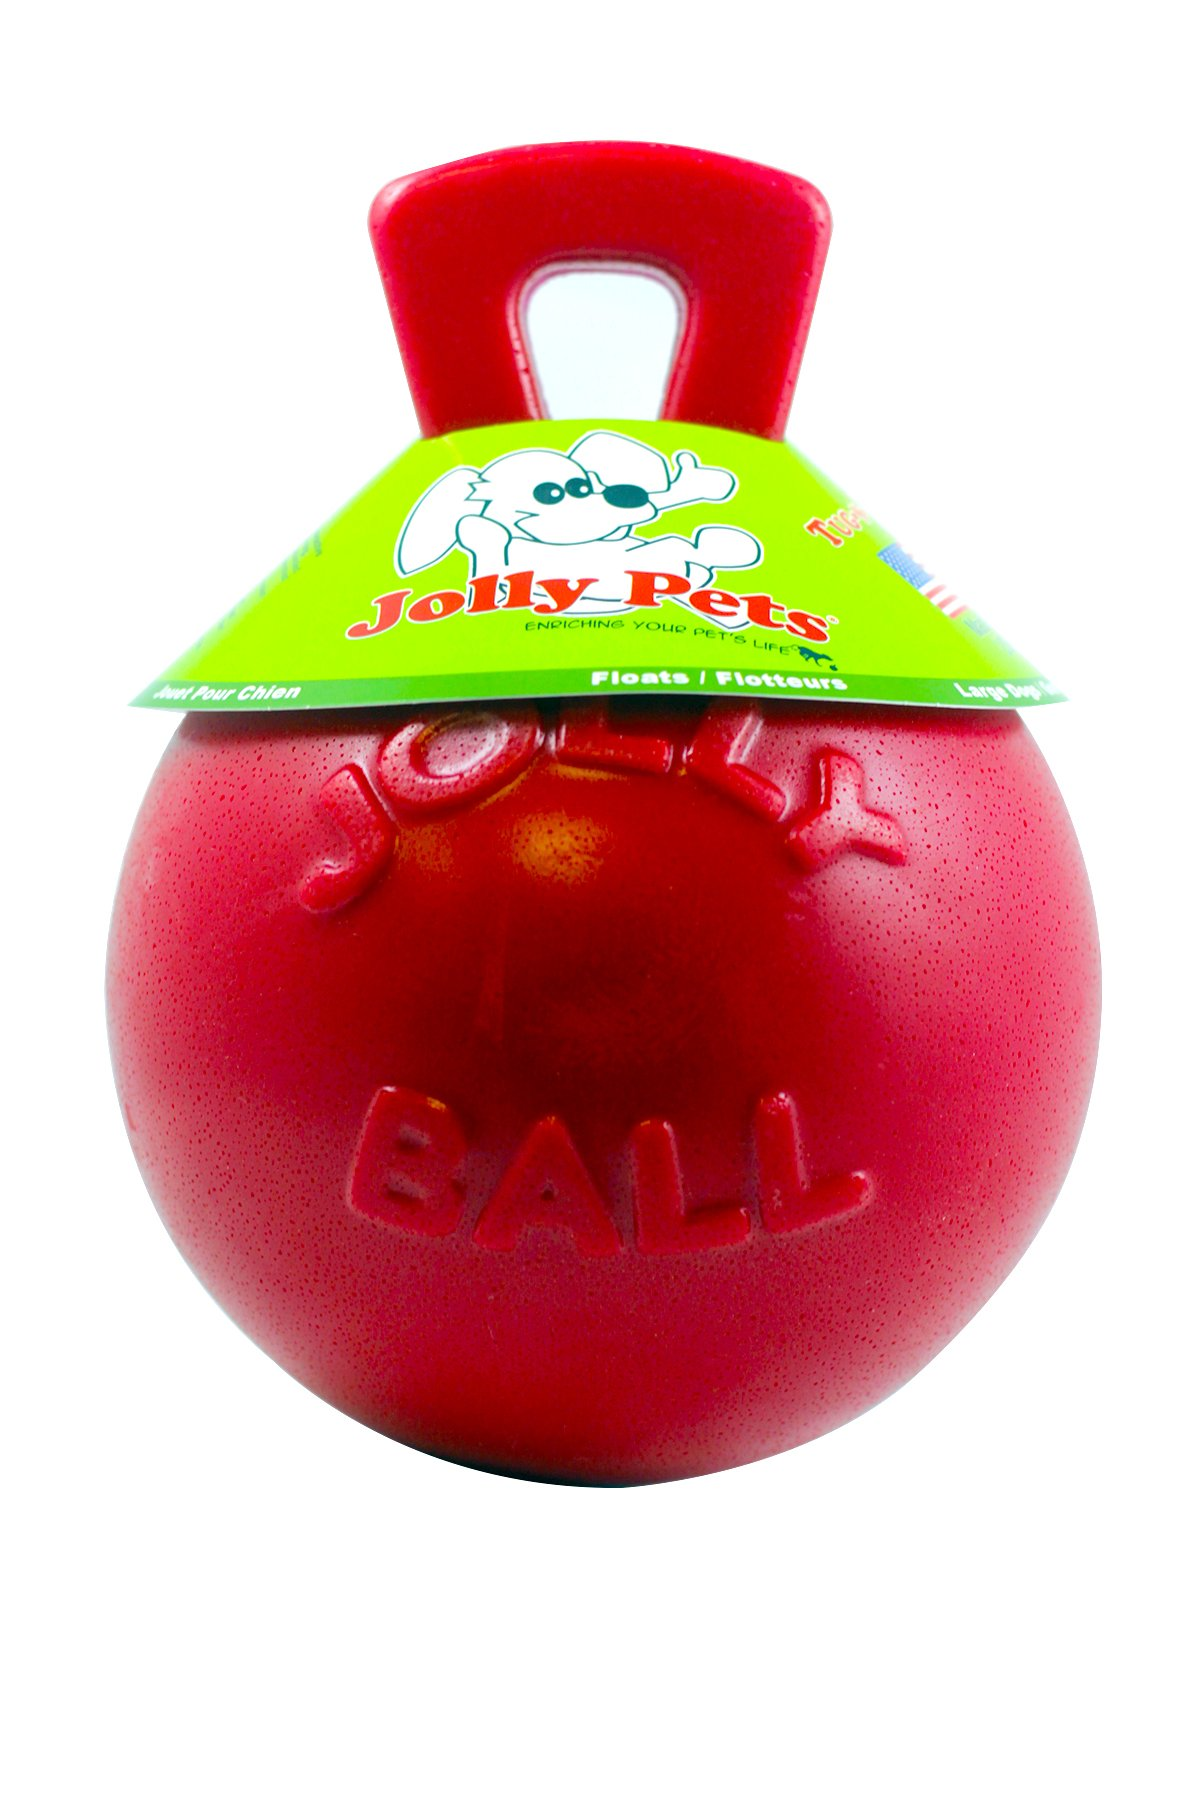 Jolly Pets Tug-n-Toss - Heavy Duty Chew Ball w/ Handle (Red, 8'')